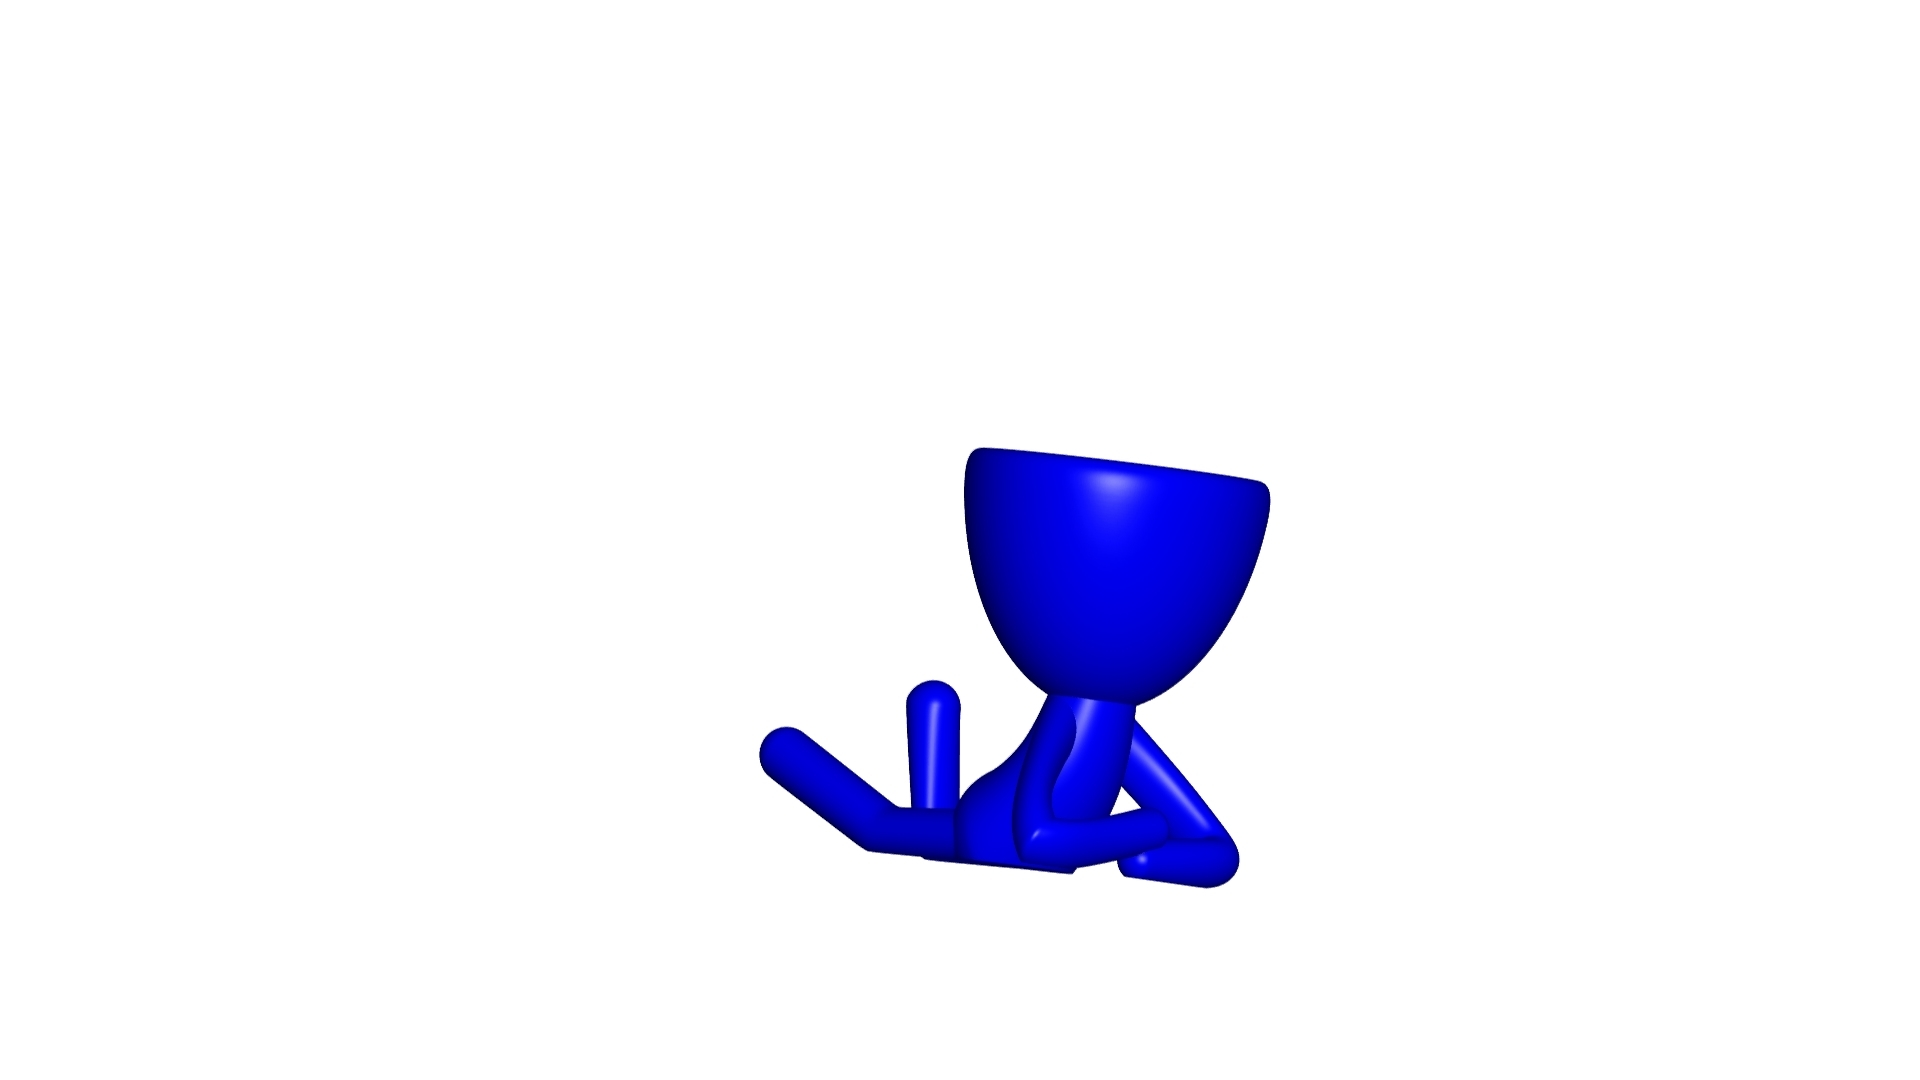 Vaso_02_1.jpg Download free STL file JARRÓN MACETA ROBERT 02 - VASE FLOWERPOT ROBERT 02 • 3D print model, PRODUSTL56